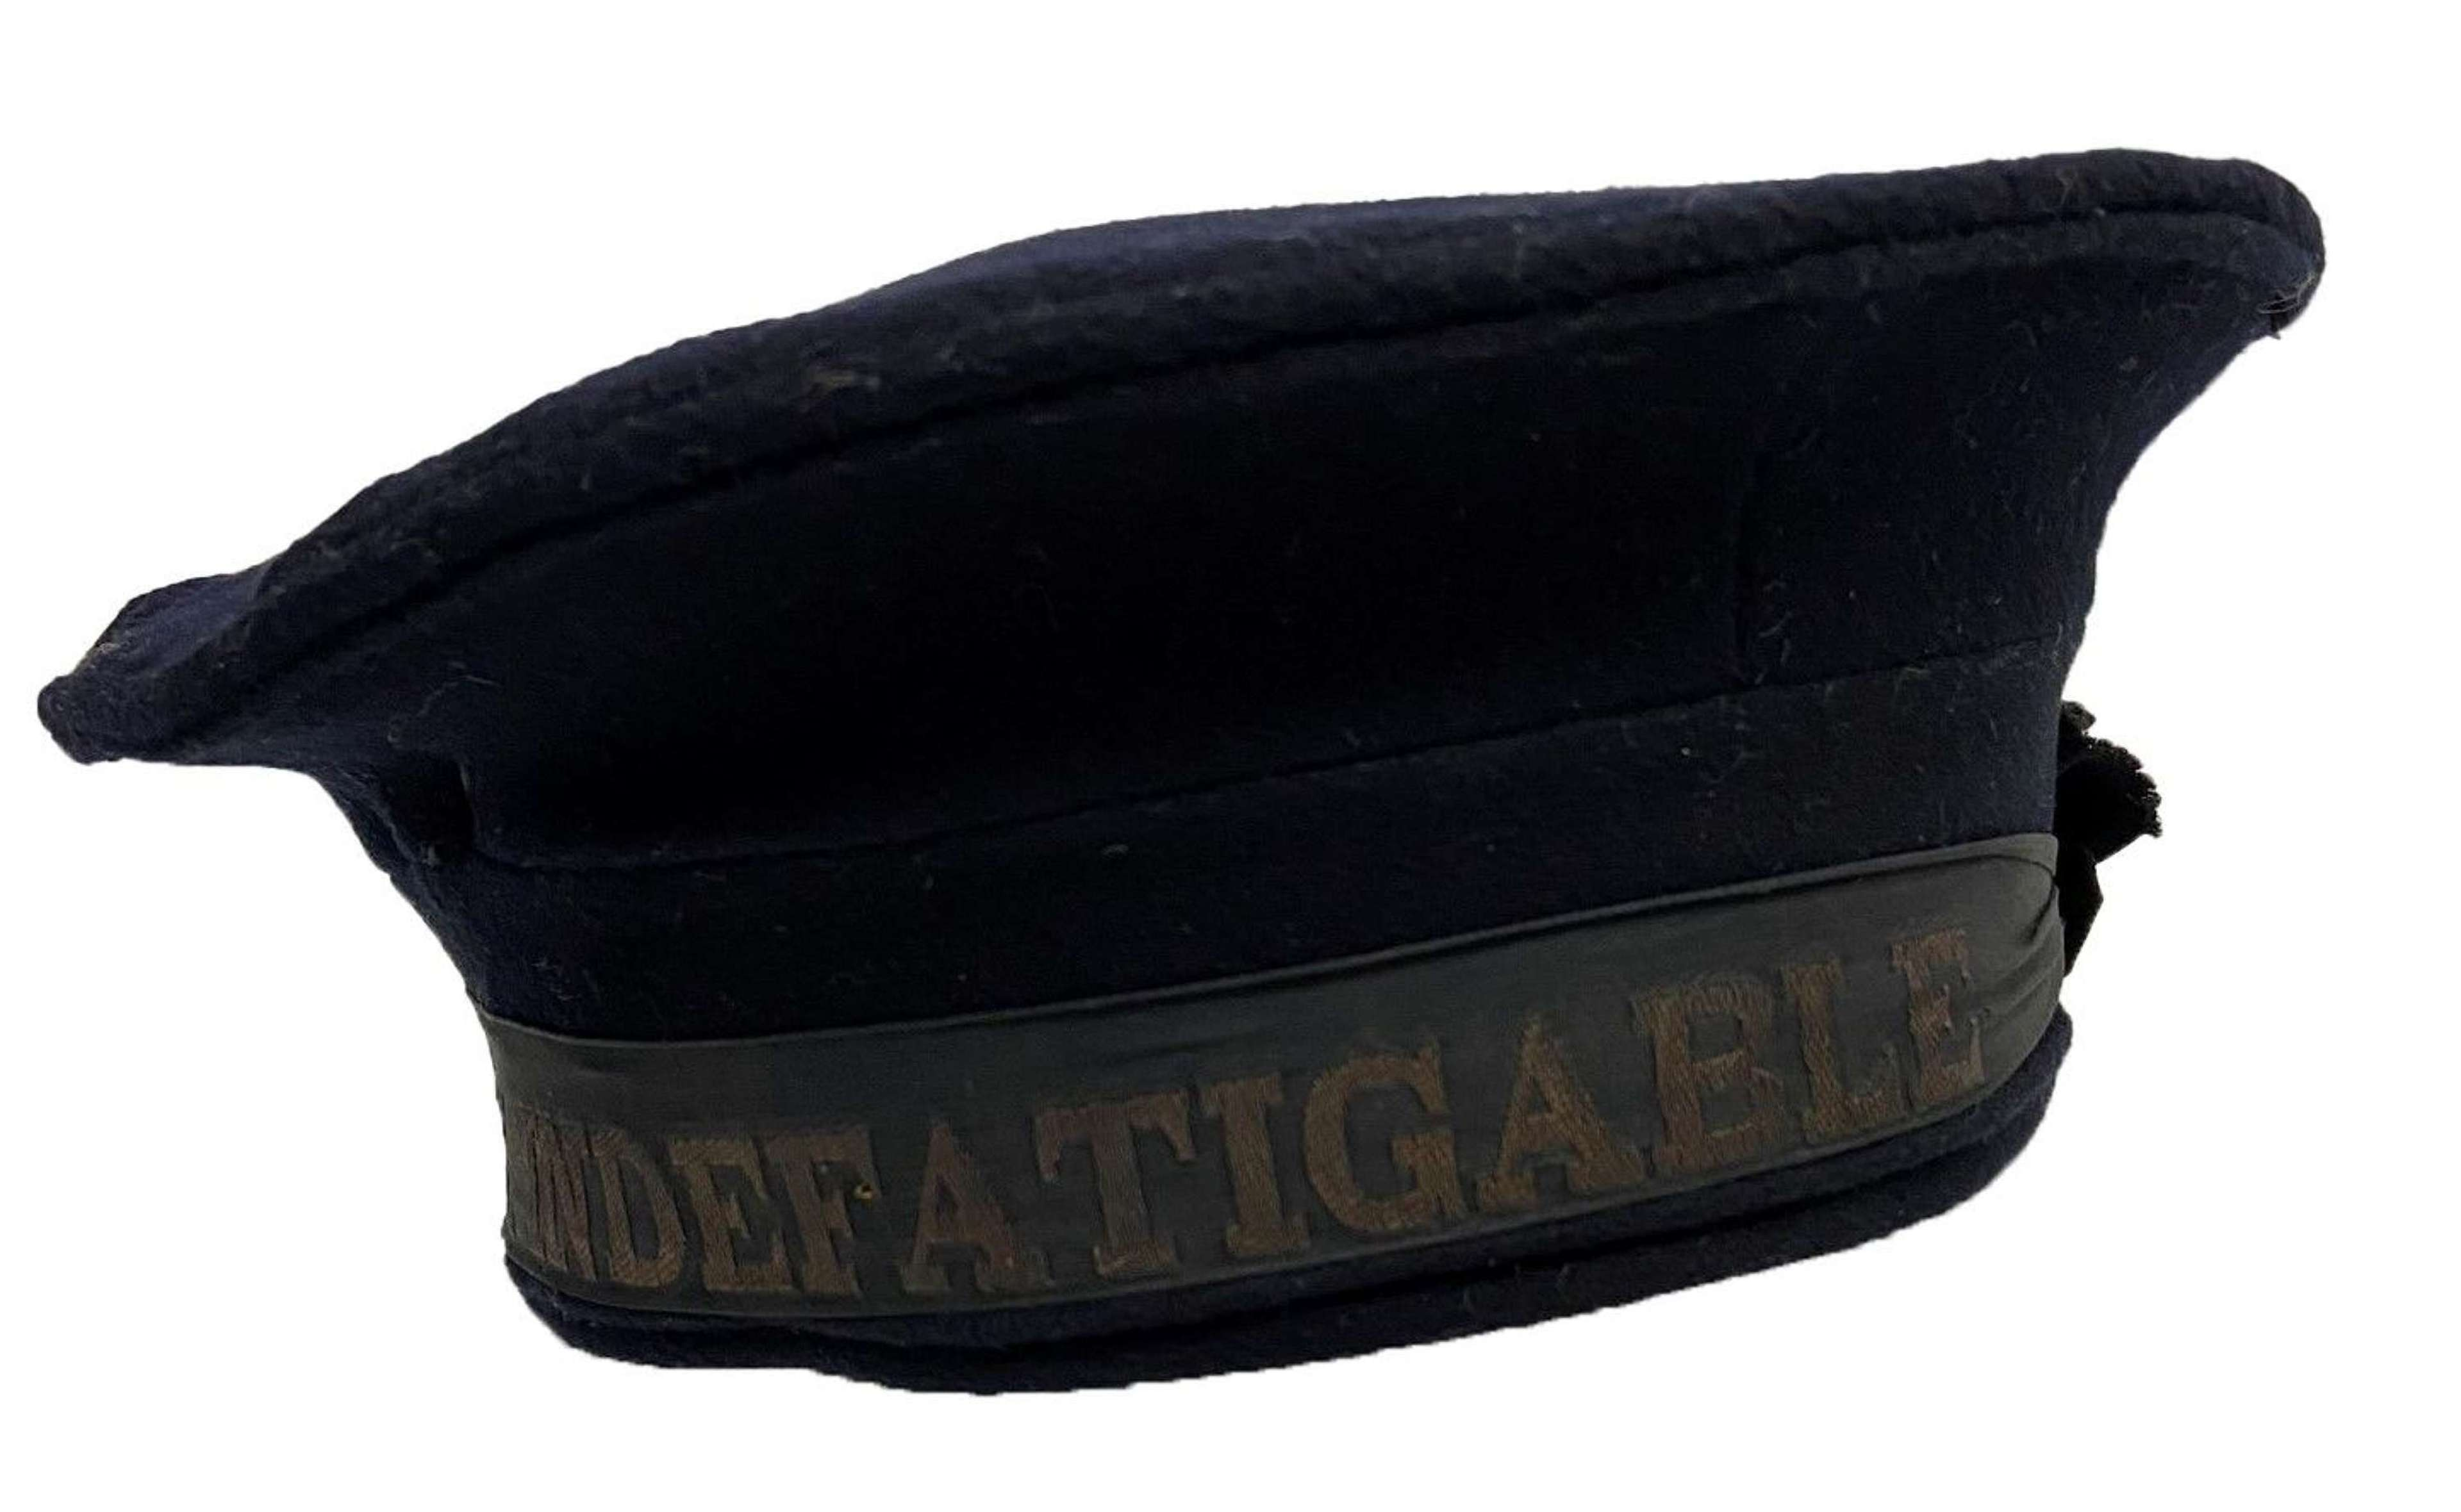 Original WW2 Royal Blue Cloth Winter Cap - HMS Indefatigable